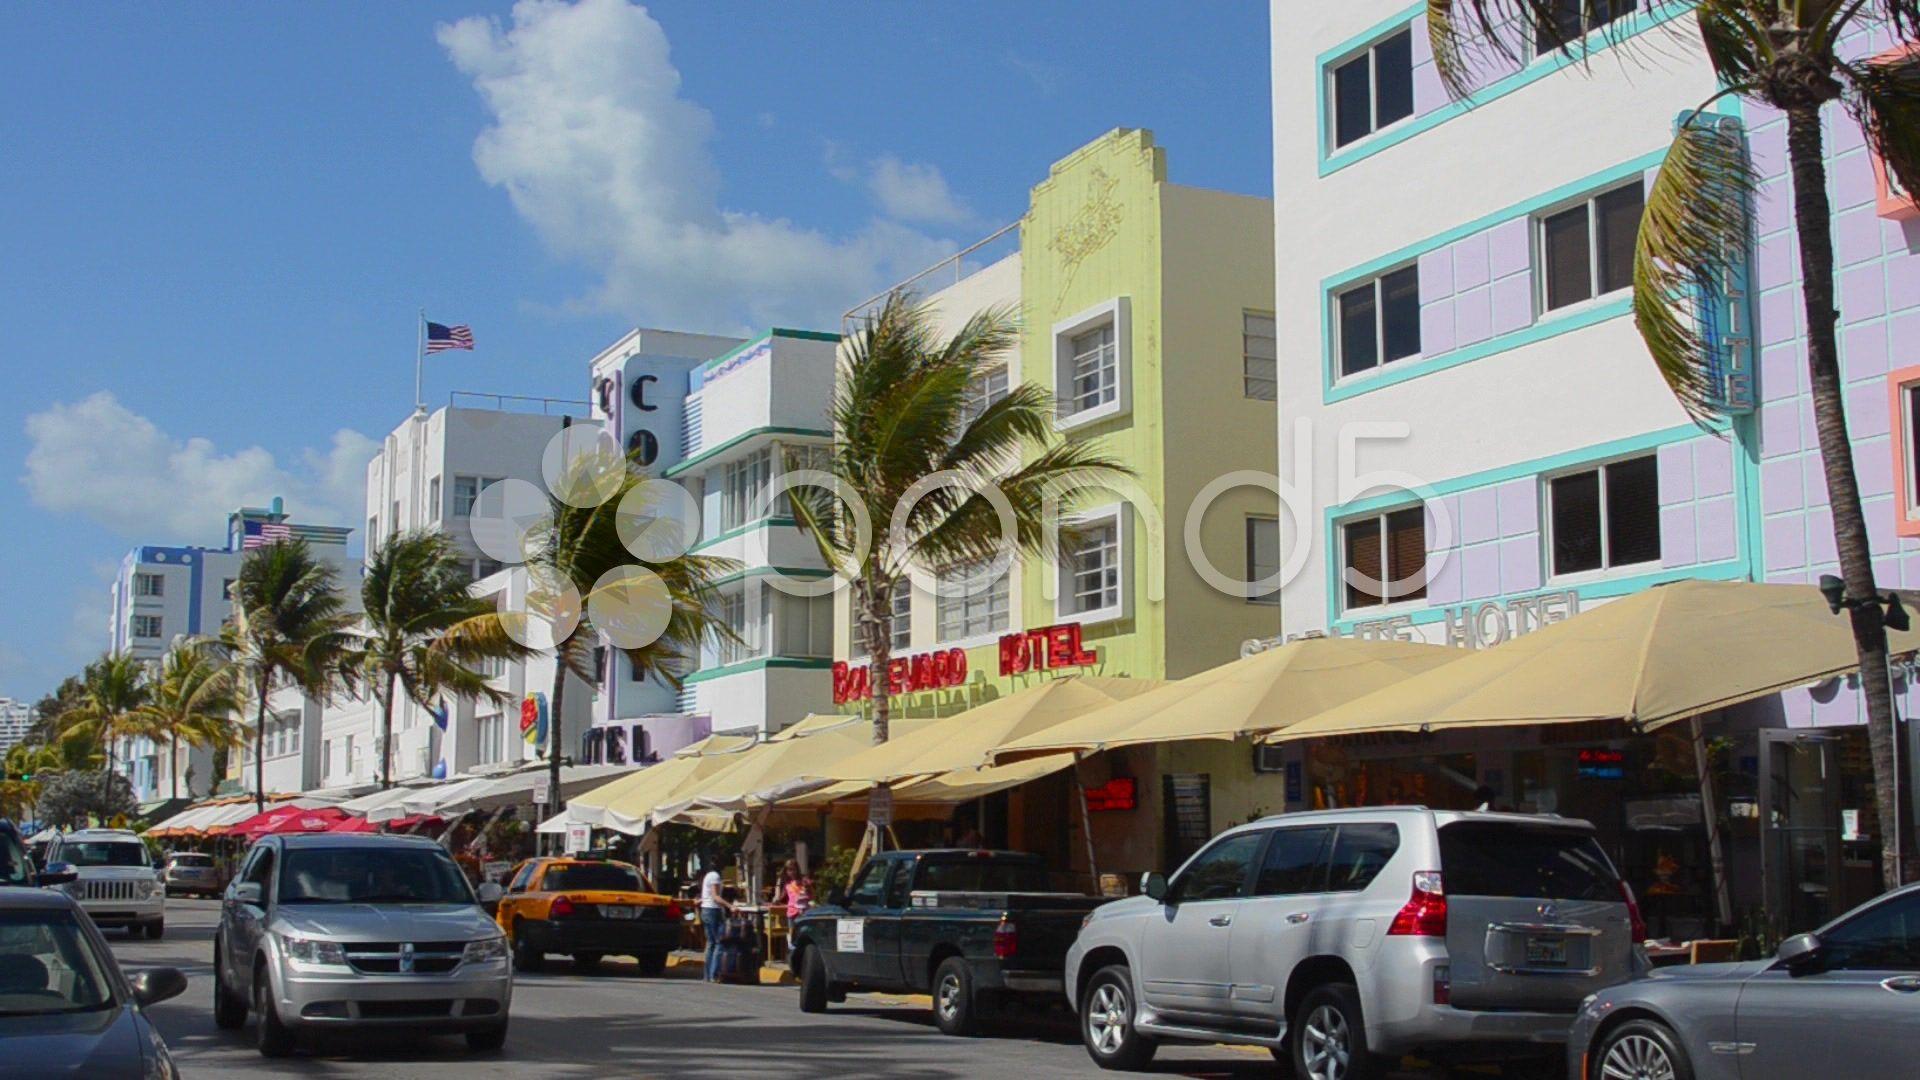 pastel retro art deco district of south miami beach ocean